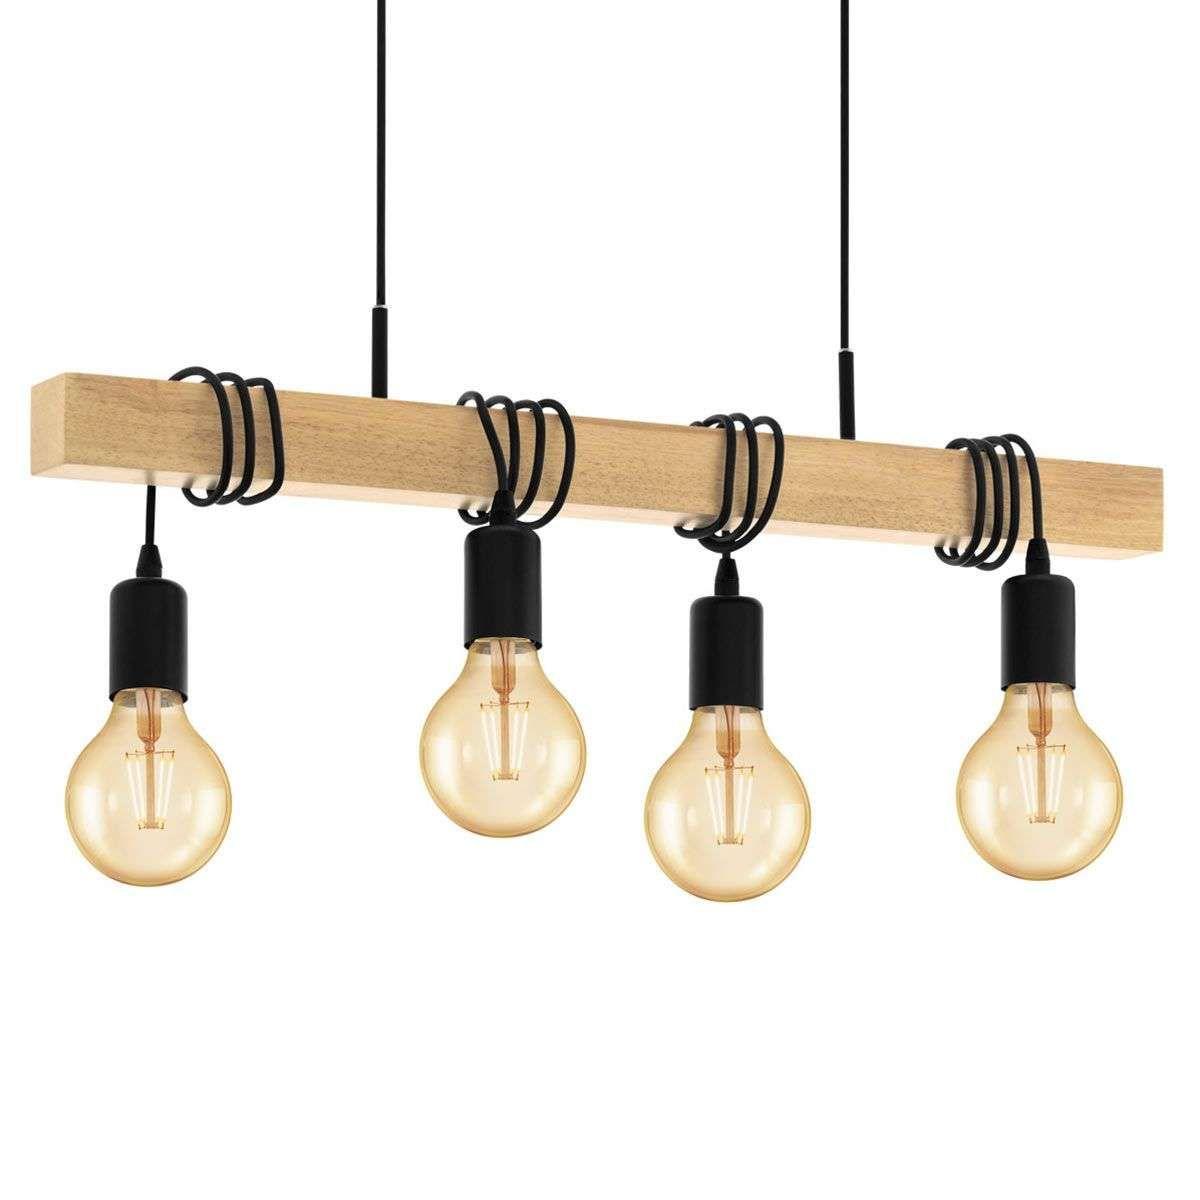 Suspension Townshend A 4 Lampes Lampe Suspendue Luminaire Lamp